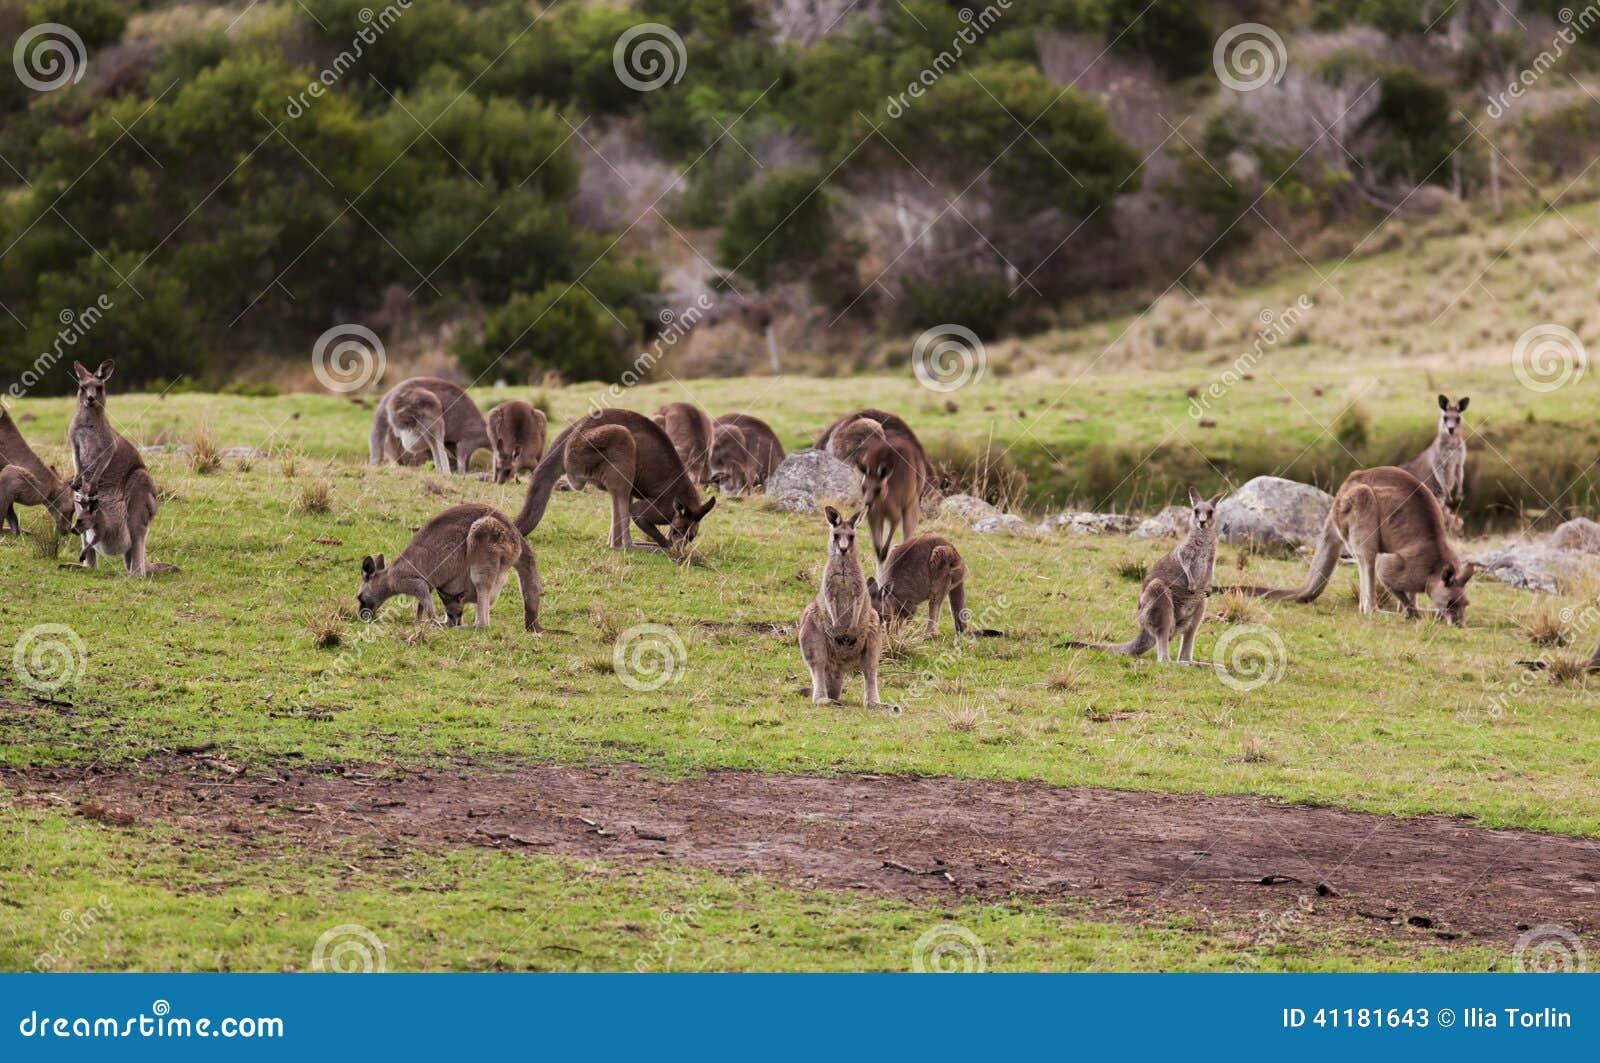 Kangaroos at sunset. Eurobodalla national park. Australia